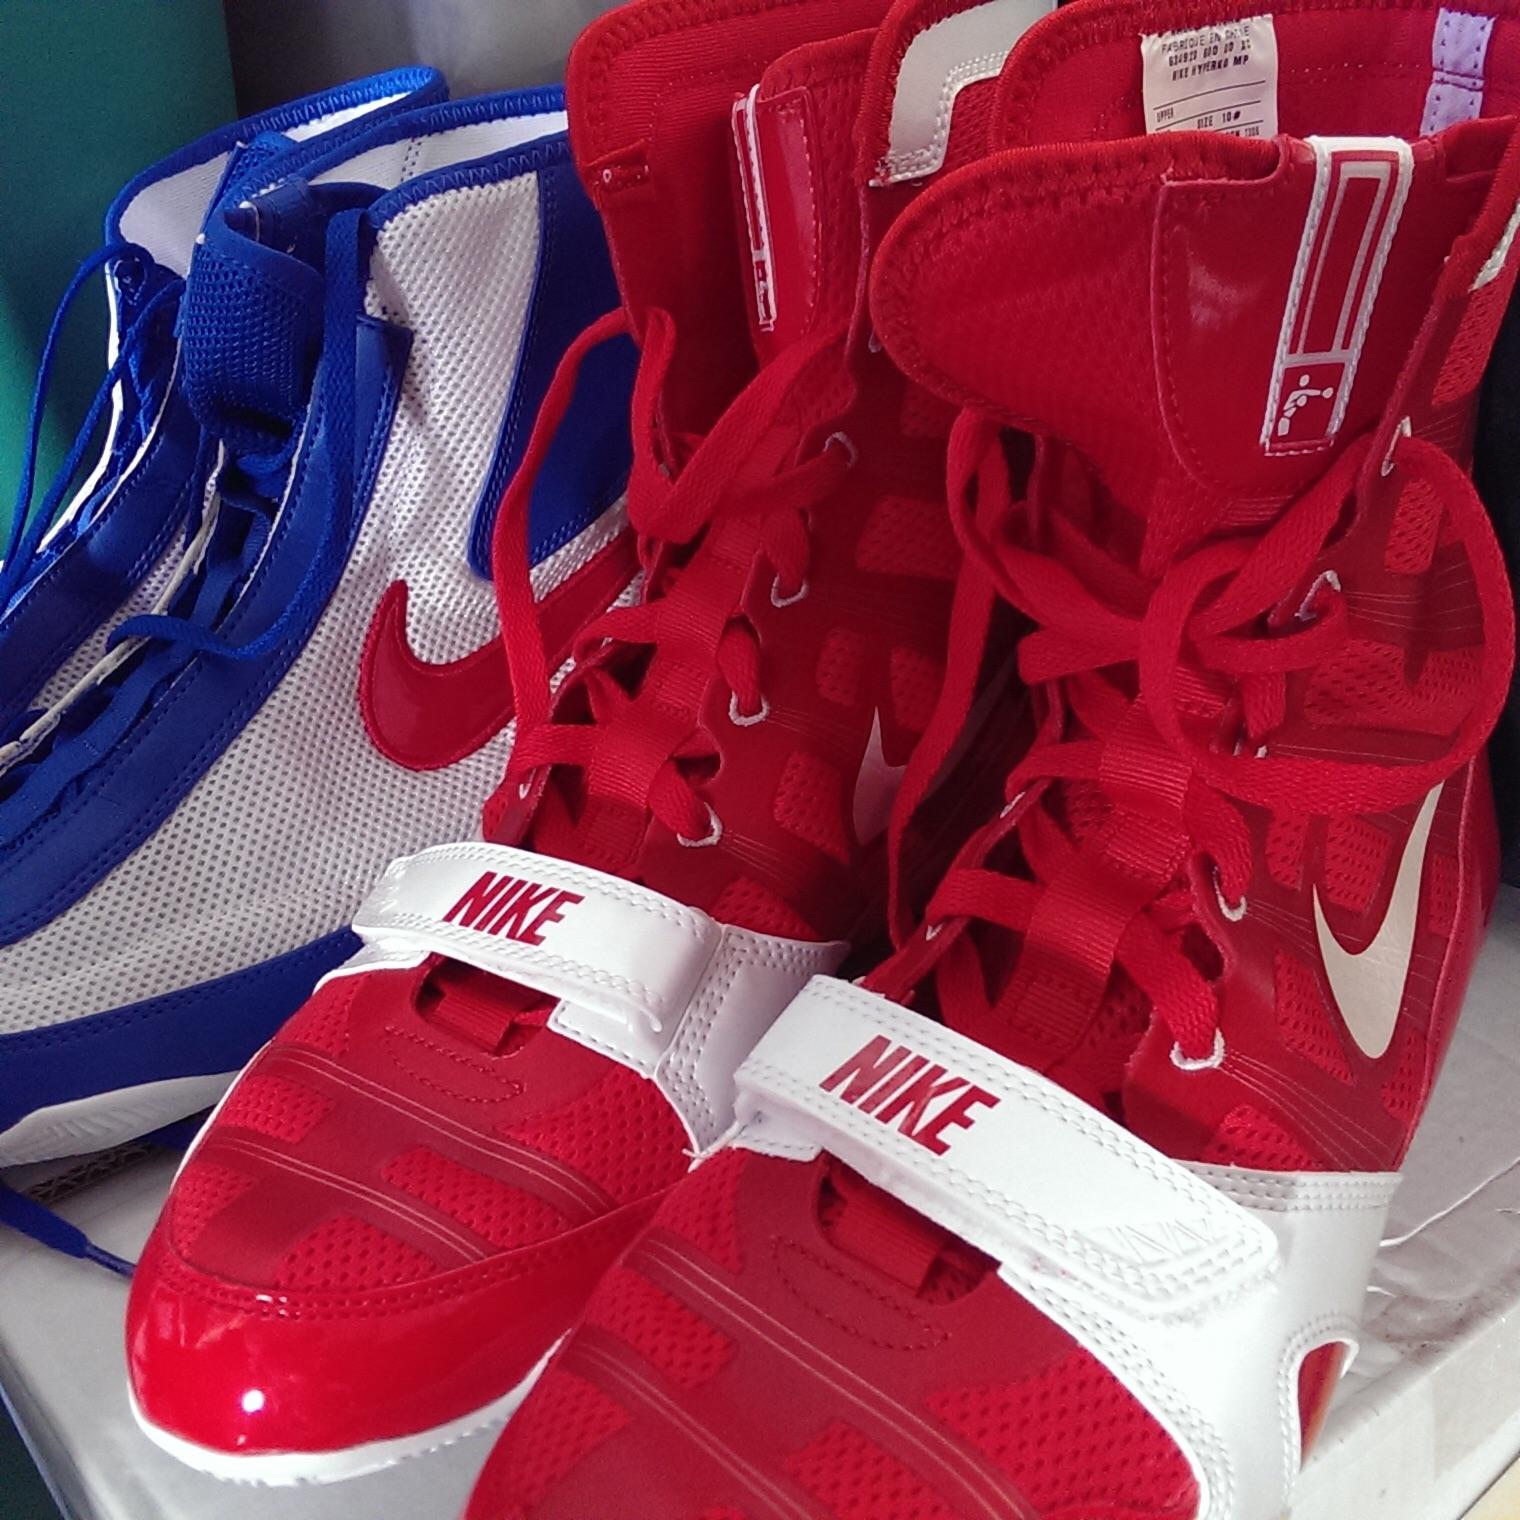 half off a3149 4e5f2 Boxing Shoes - Nike HyperKO and Nike Machomai